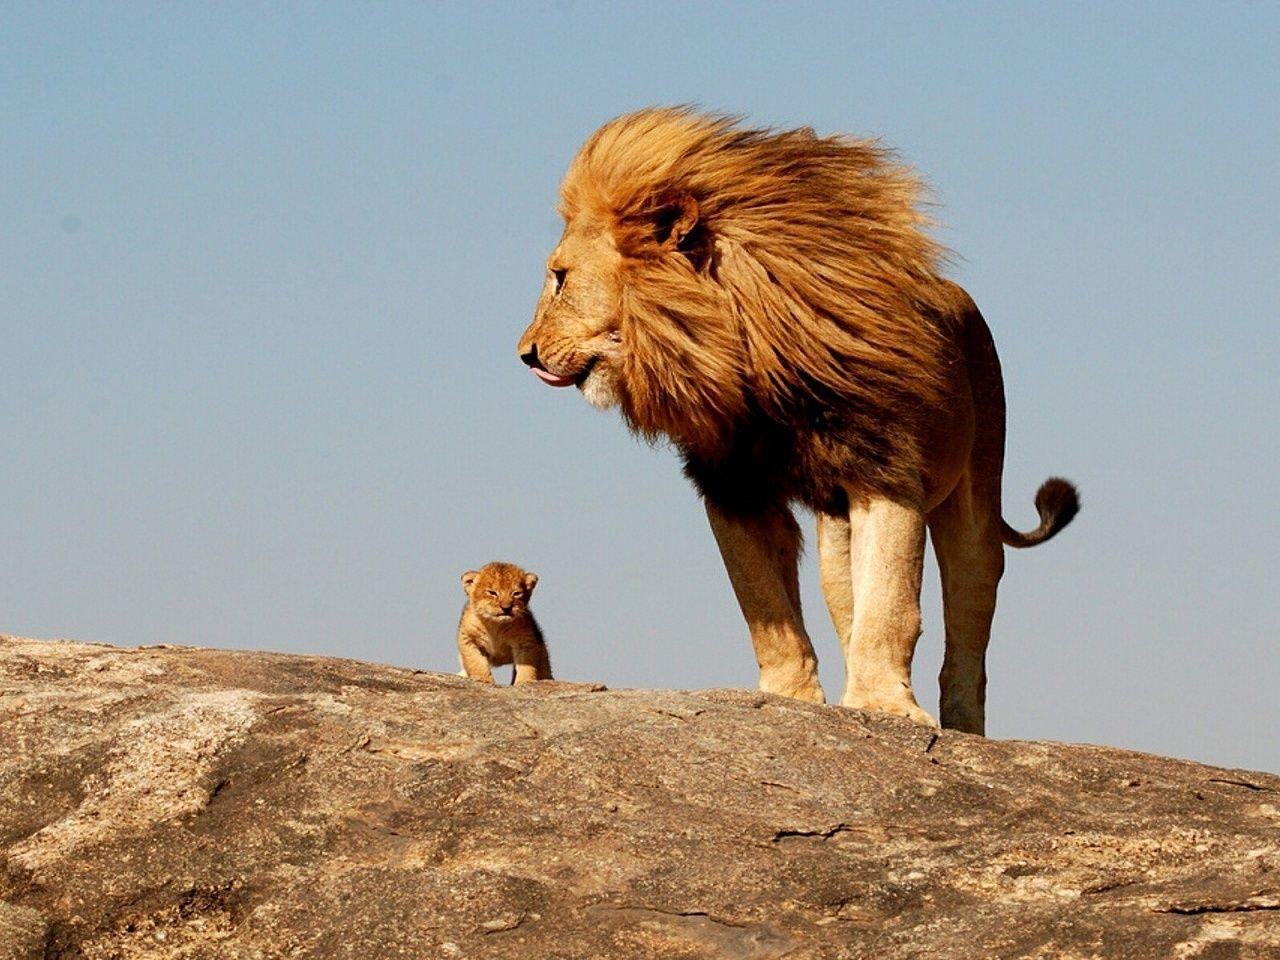 Lion Cub Wallpapers - Wallpaper Cave